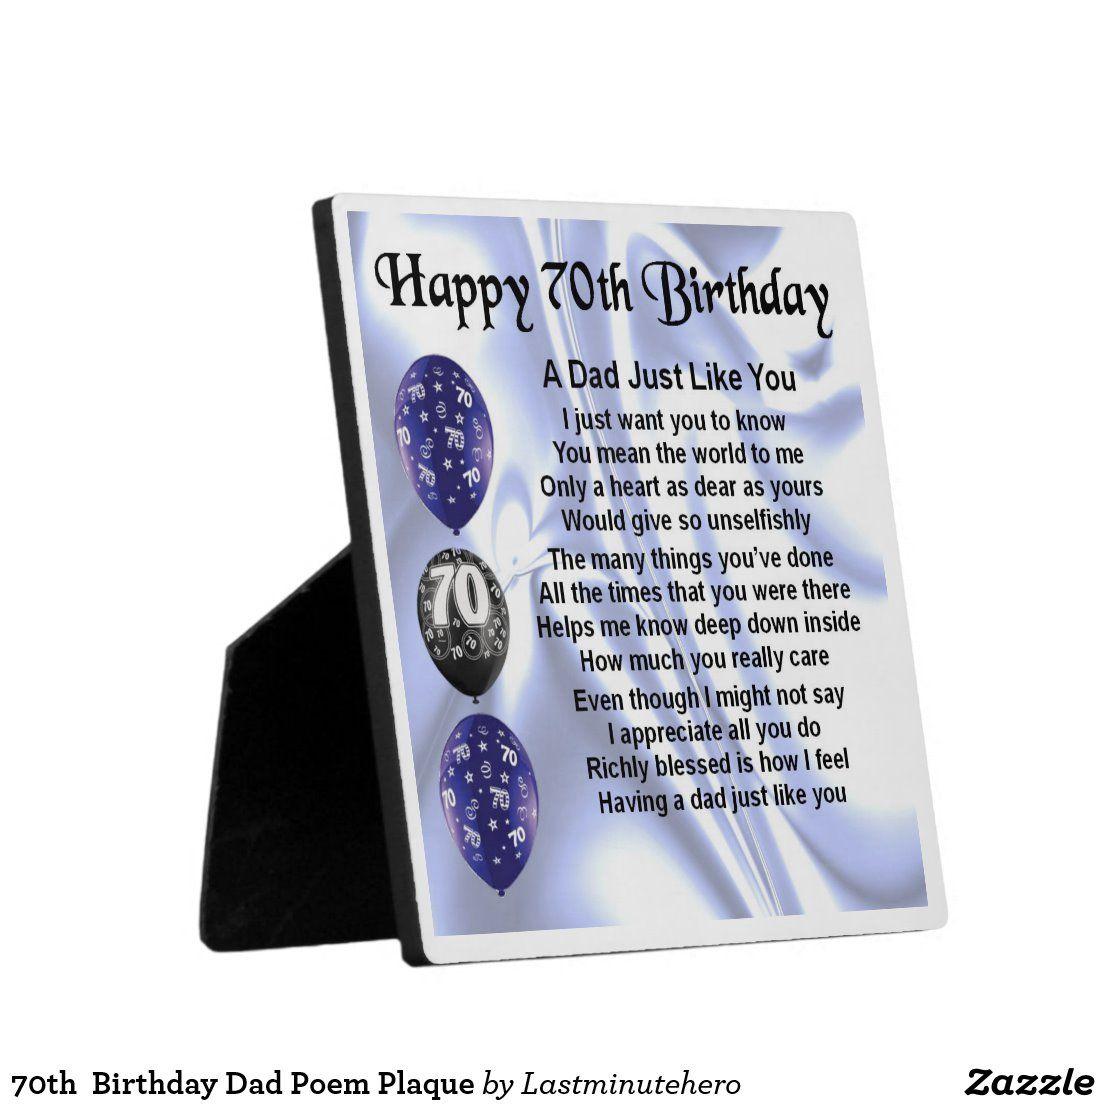 70th Birthday Dad Poem Plaque Zazzle Co Uk 70th Birthday Husband Birthday 70th Birthday Card